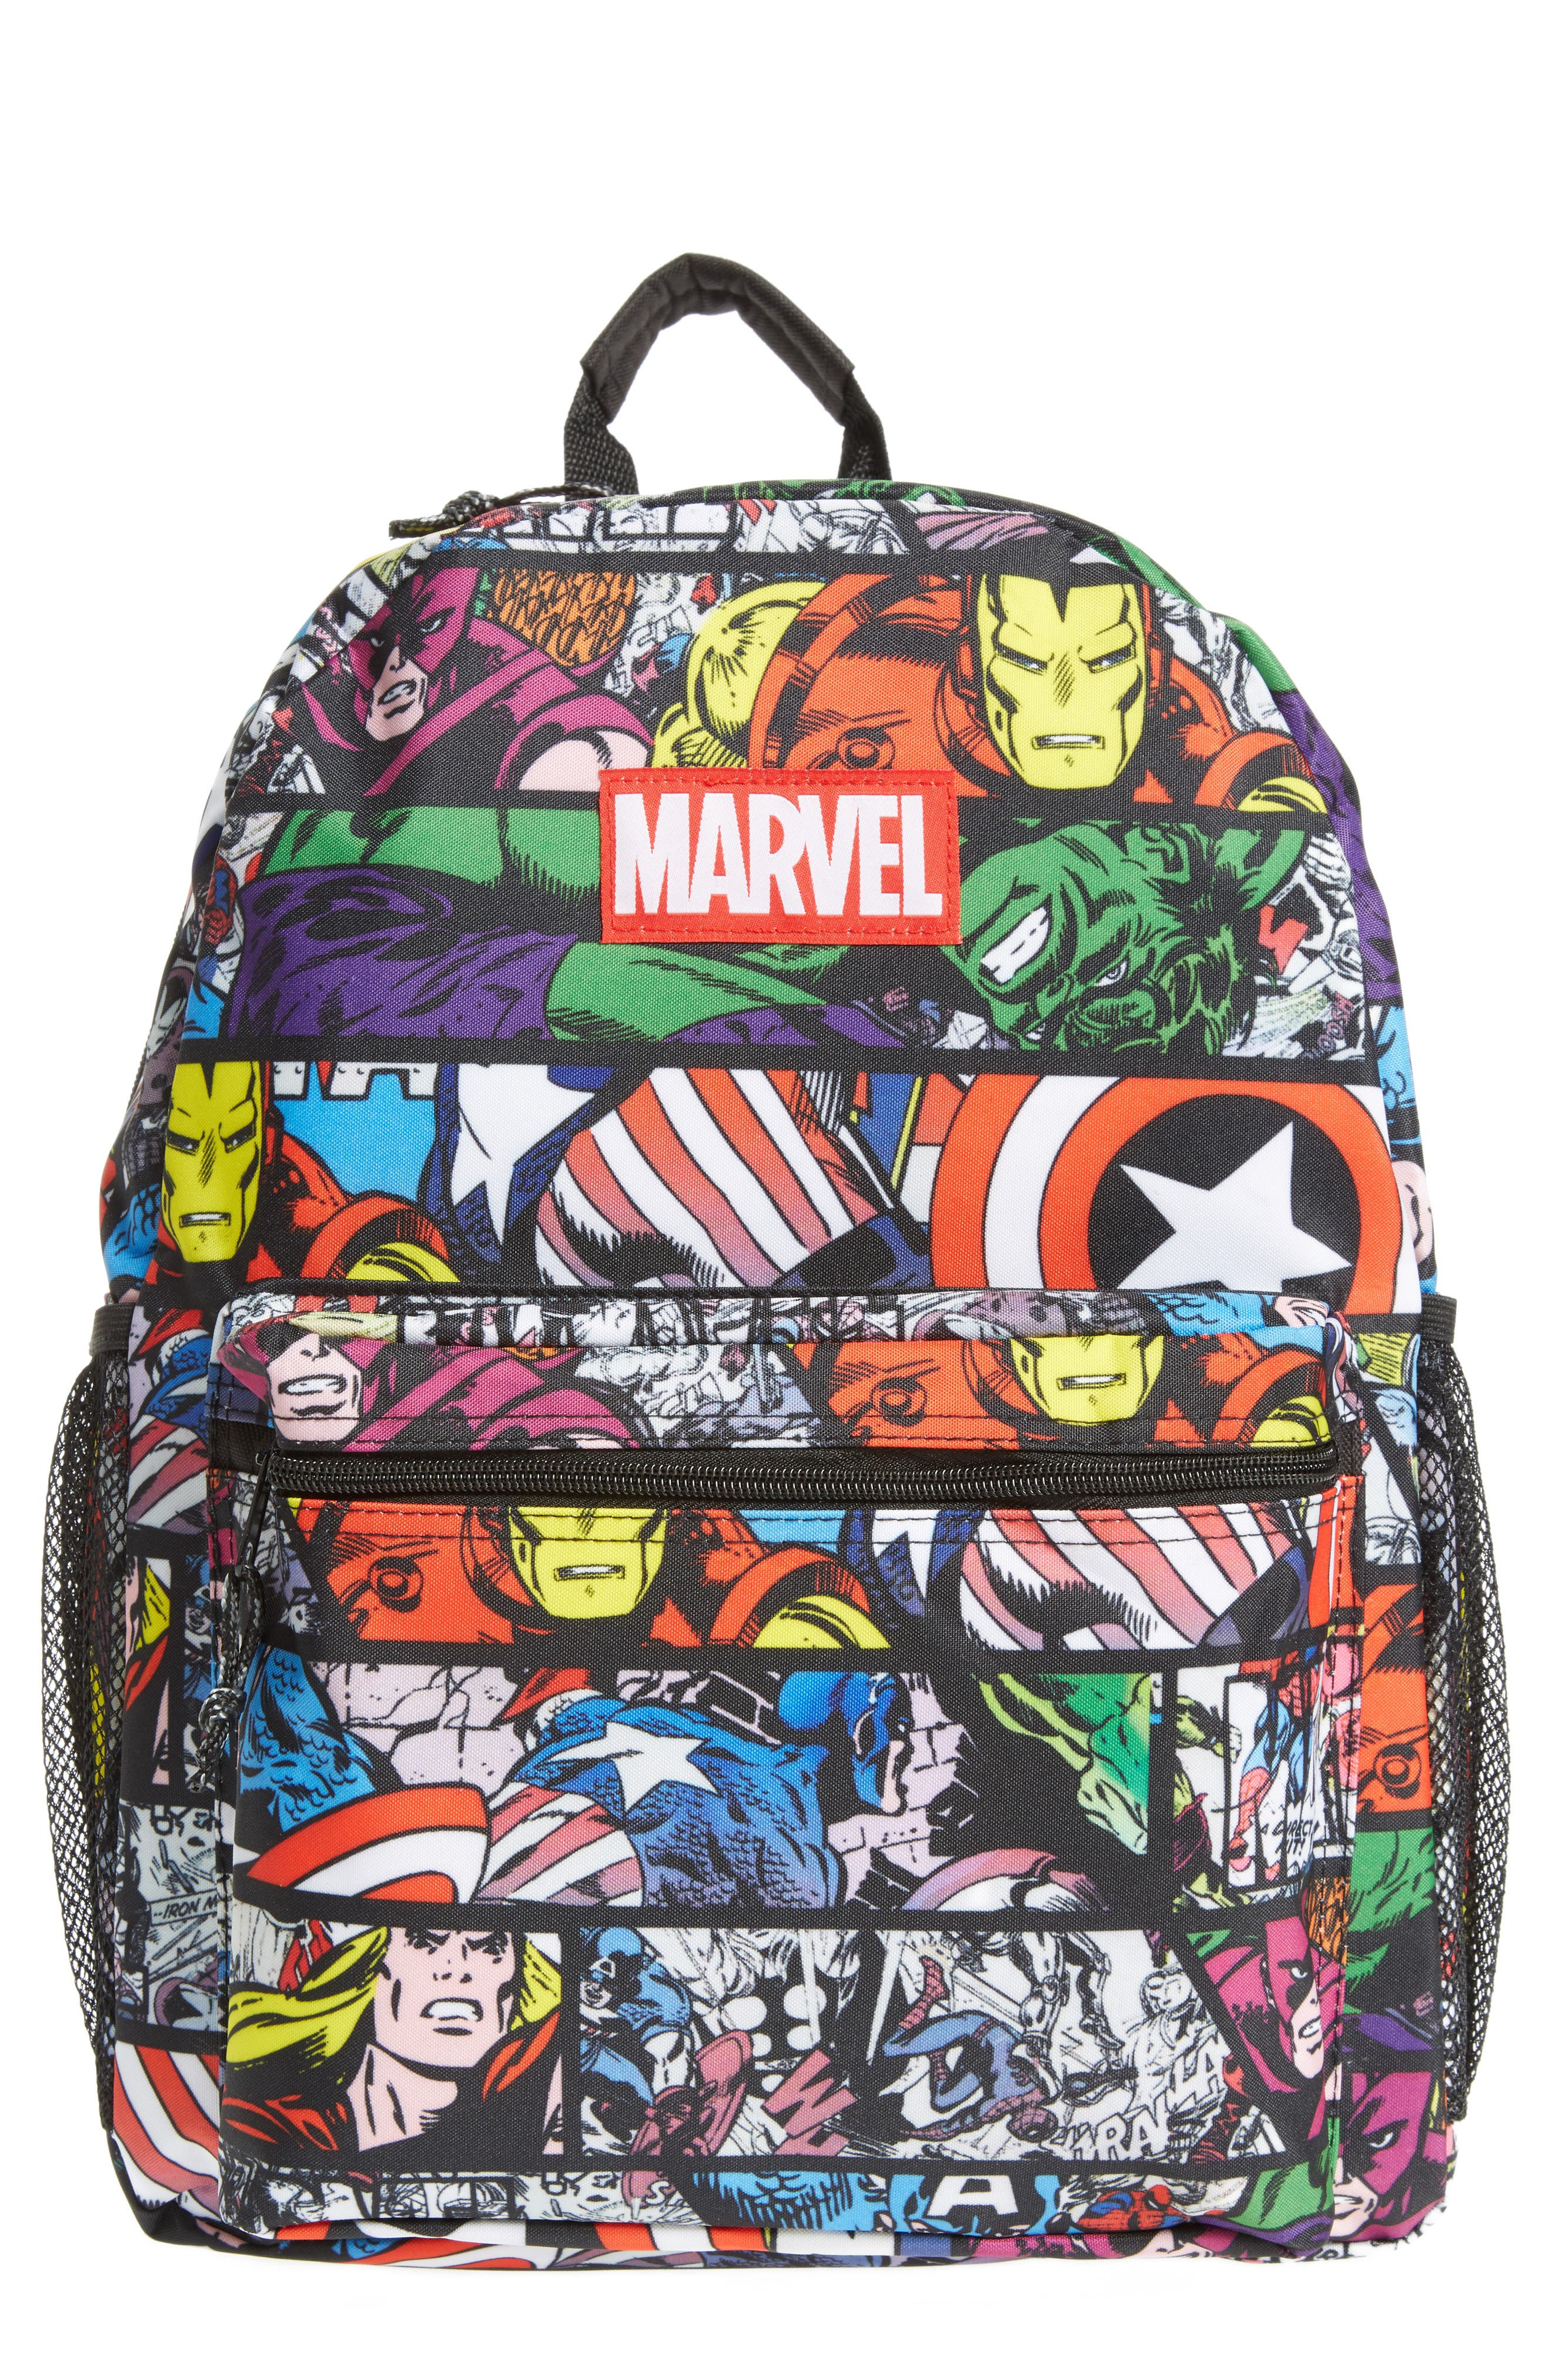 Alternate Image 1 Selected - Marvel Allover Print Backpack (Kids)